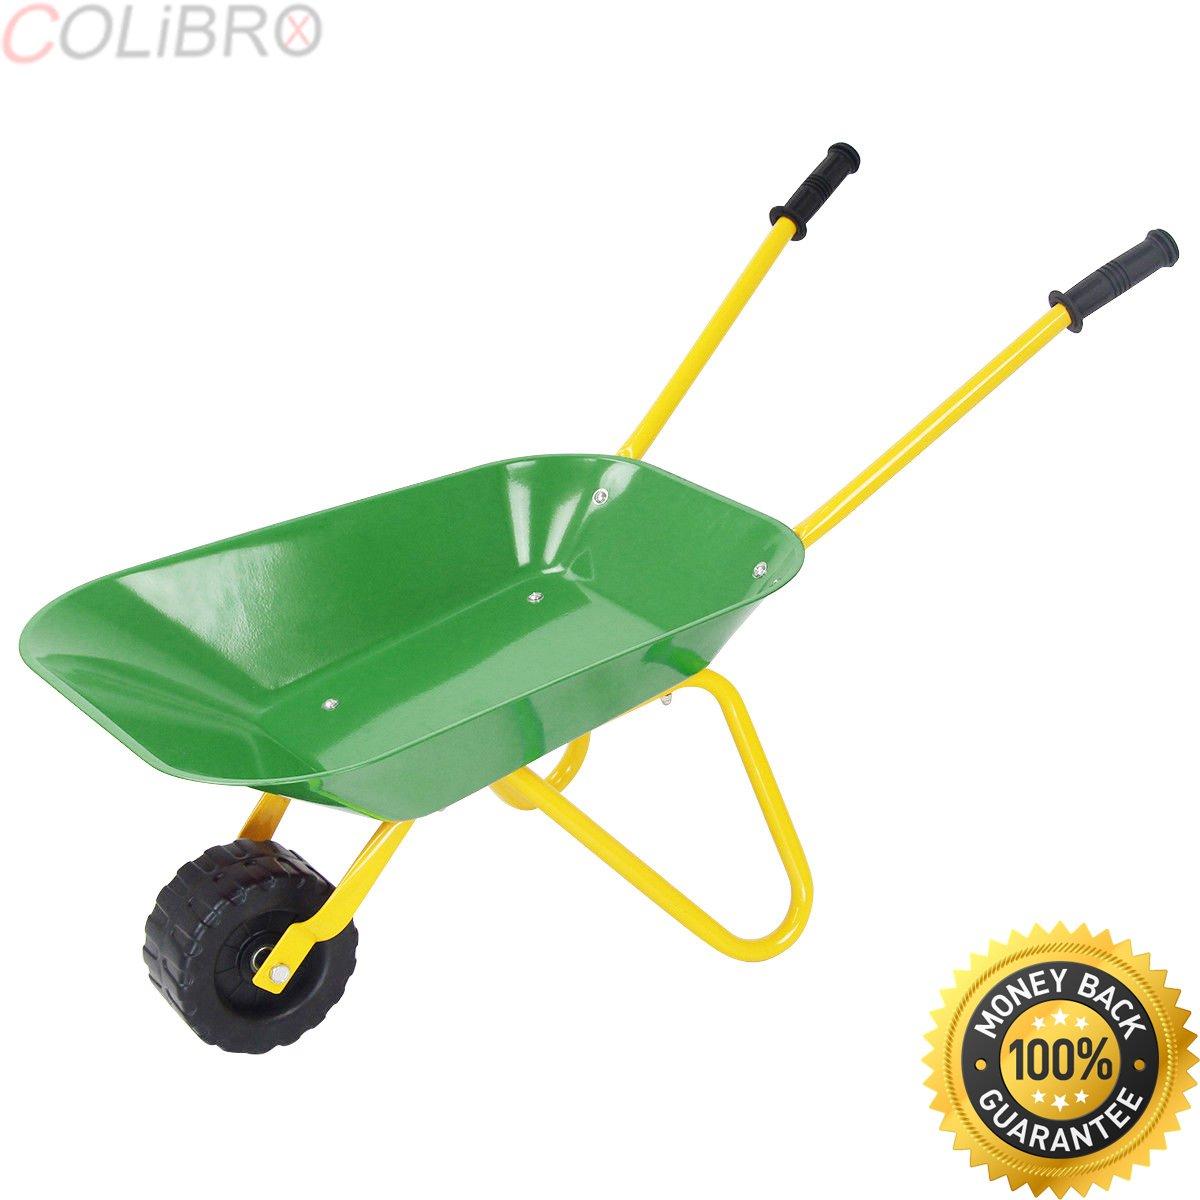 COLIBROX--Kids Metal Wheelbarrow Children's Size Outdoor Garden Backyard Play Toy Green. child size wheelbarrow. john deere childrens wheelbarrow. mini toy wheelbarrow. kids wheelbarrow for sale.